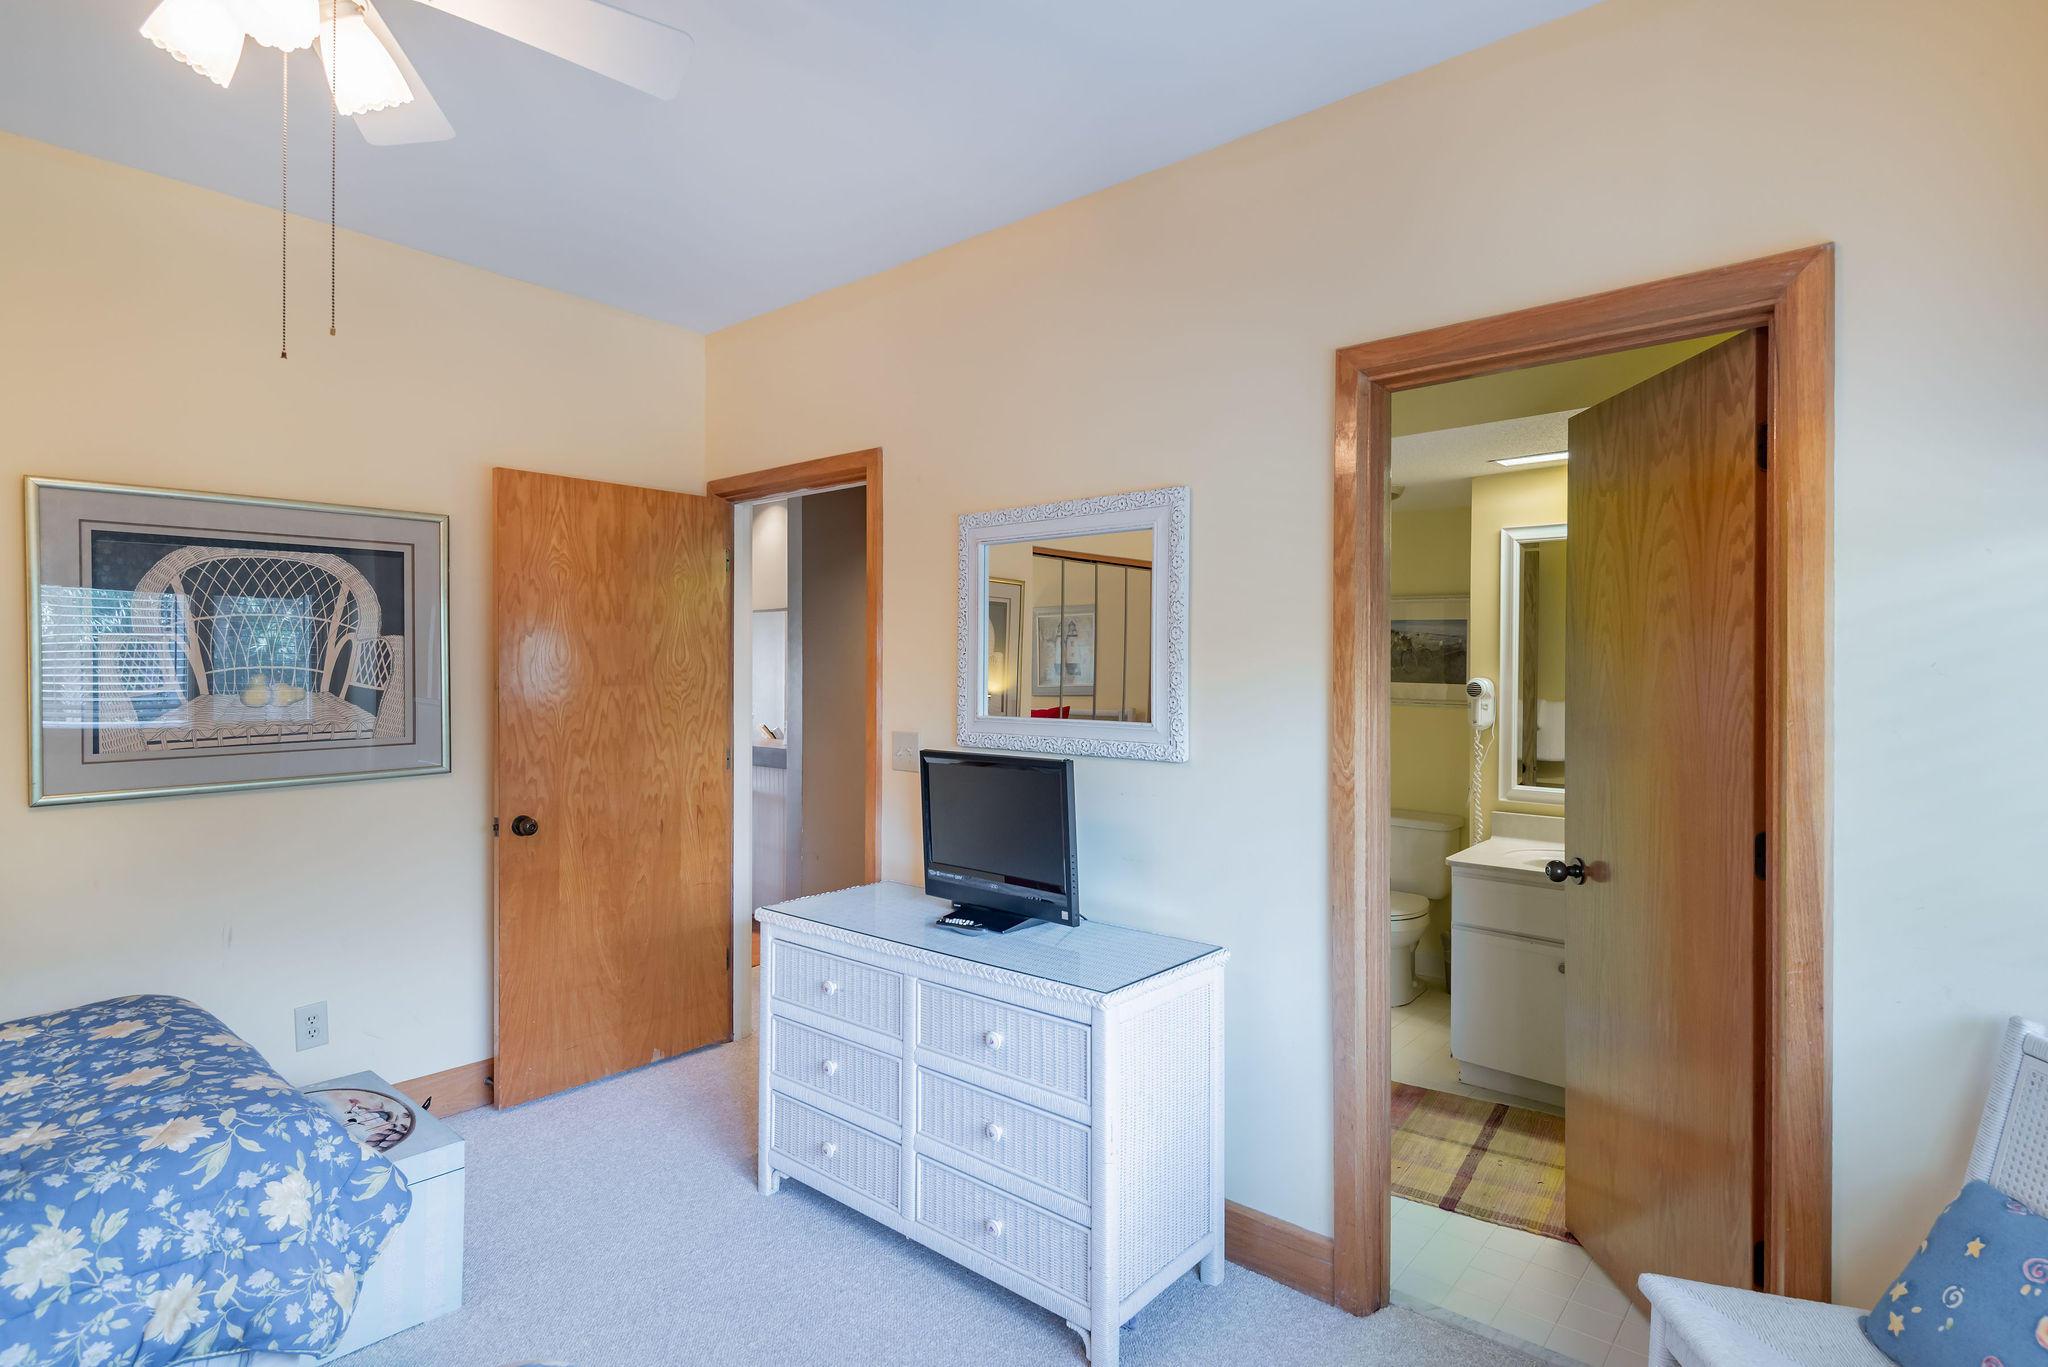 Kiawah Island Homes For Sale - 5004 Green Dolphin, Kiawah Island, SC - 17